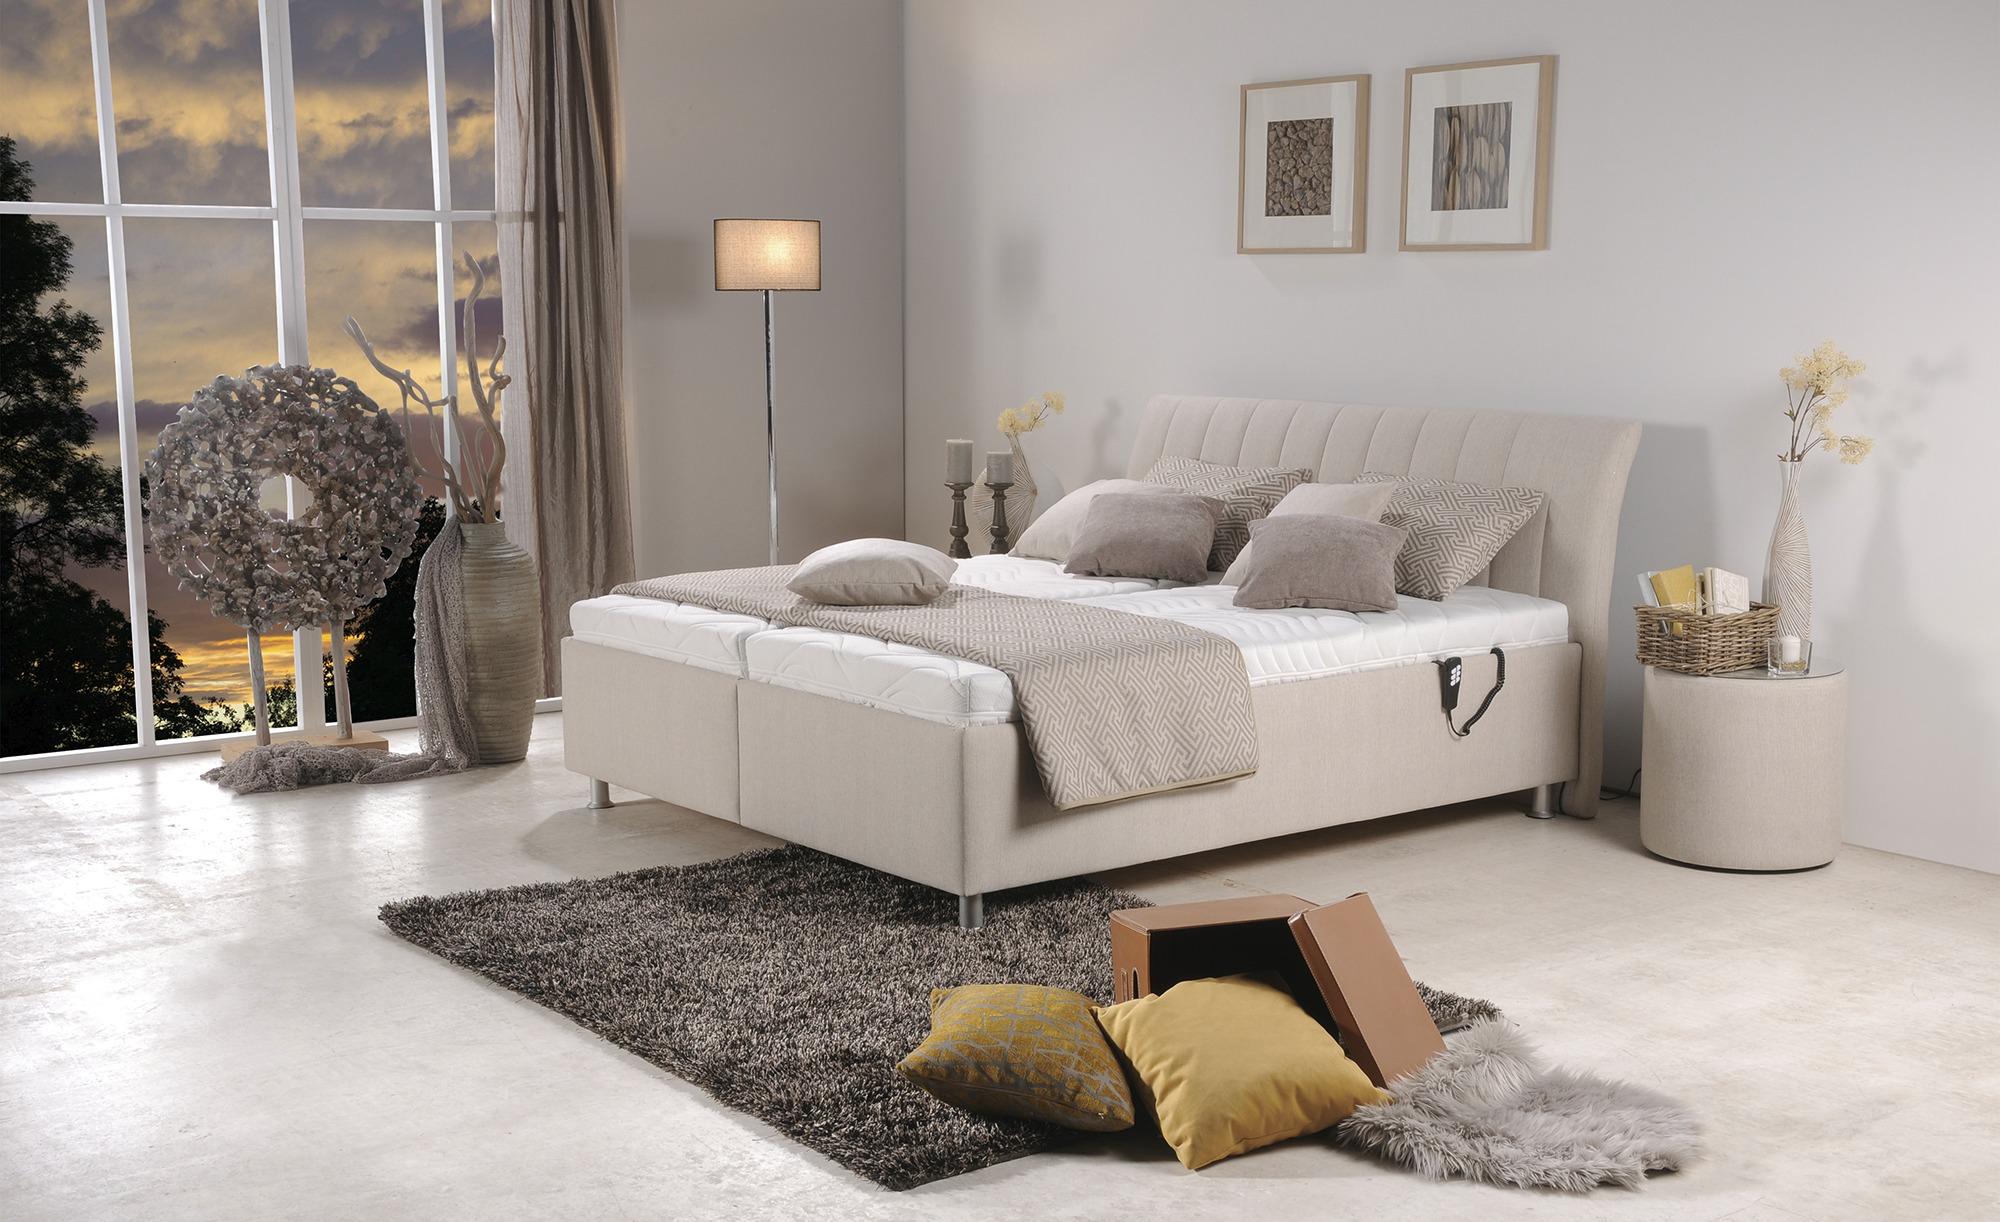 Polsterbett  Arezzo ¦ beige ¦ Maße (cm): B: 195 H: 106 Betten > Polsterbetten - Höffner